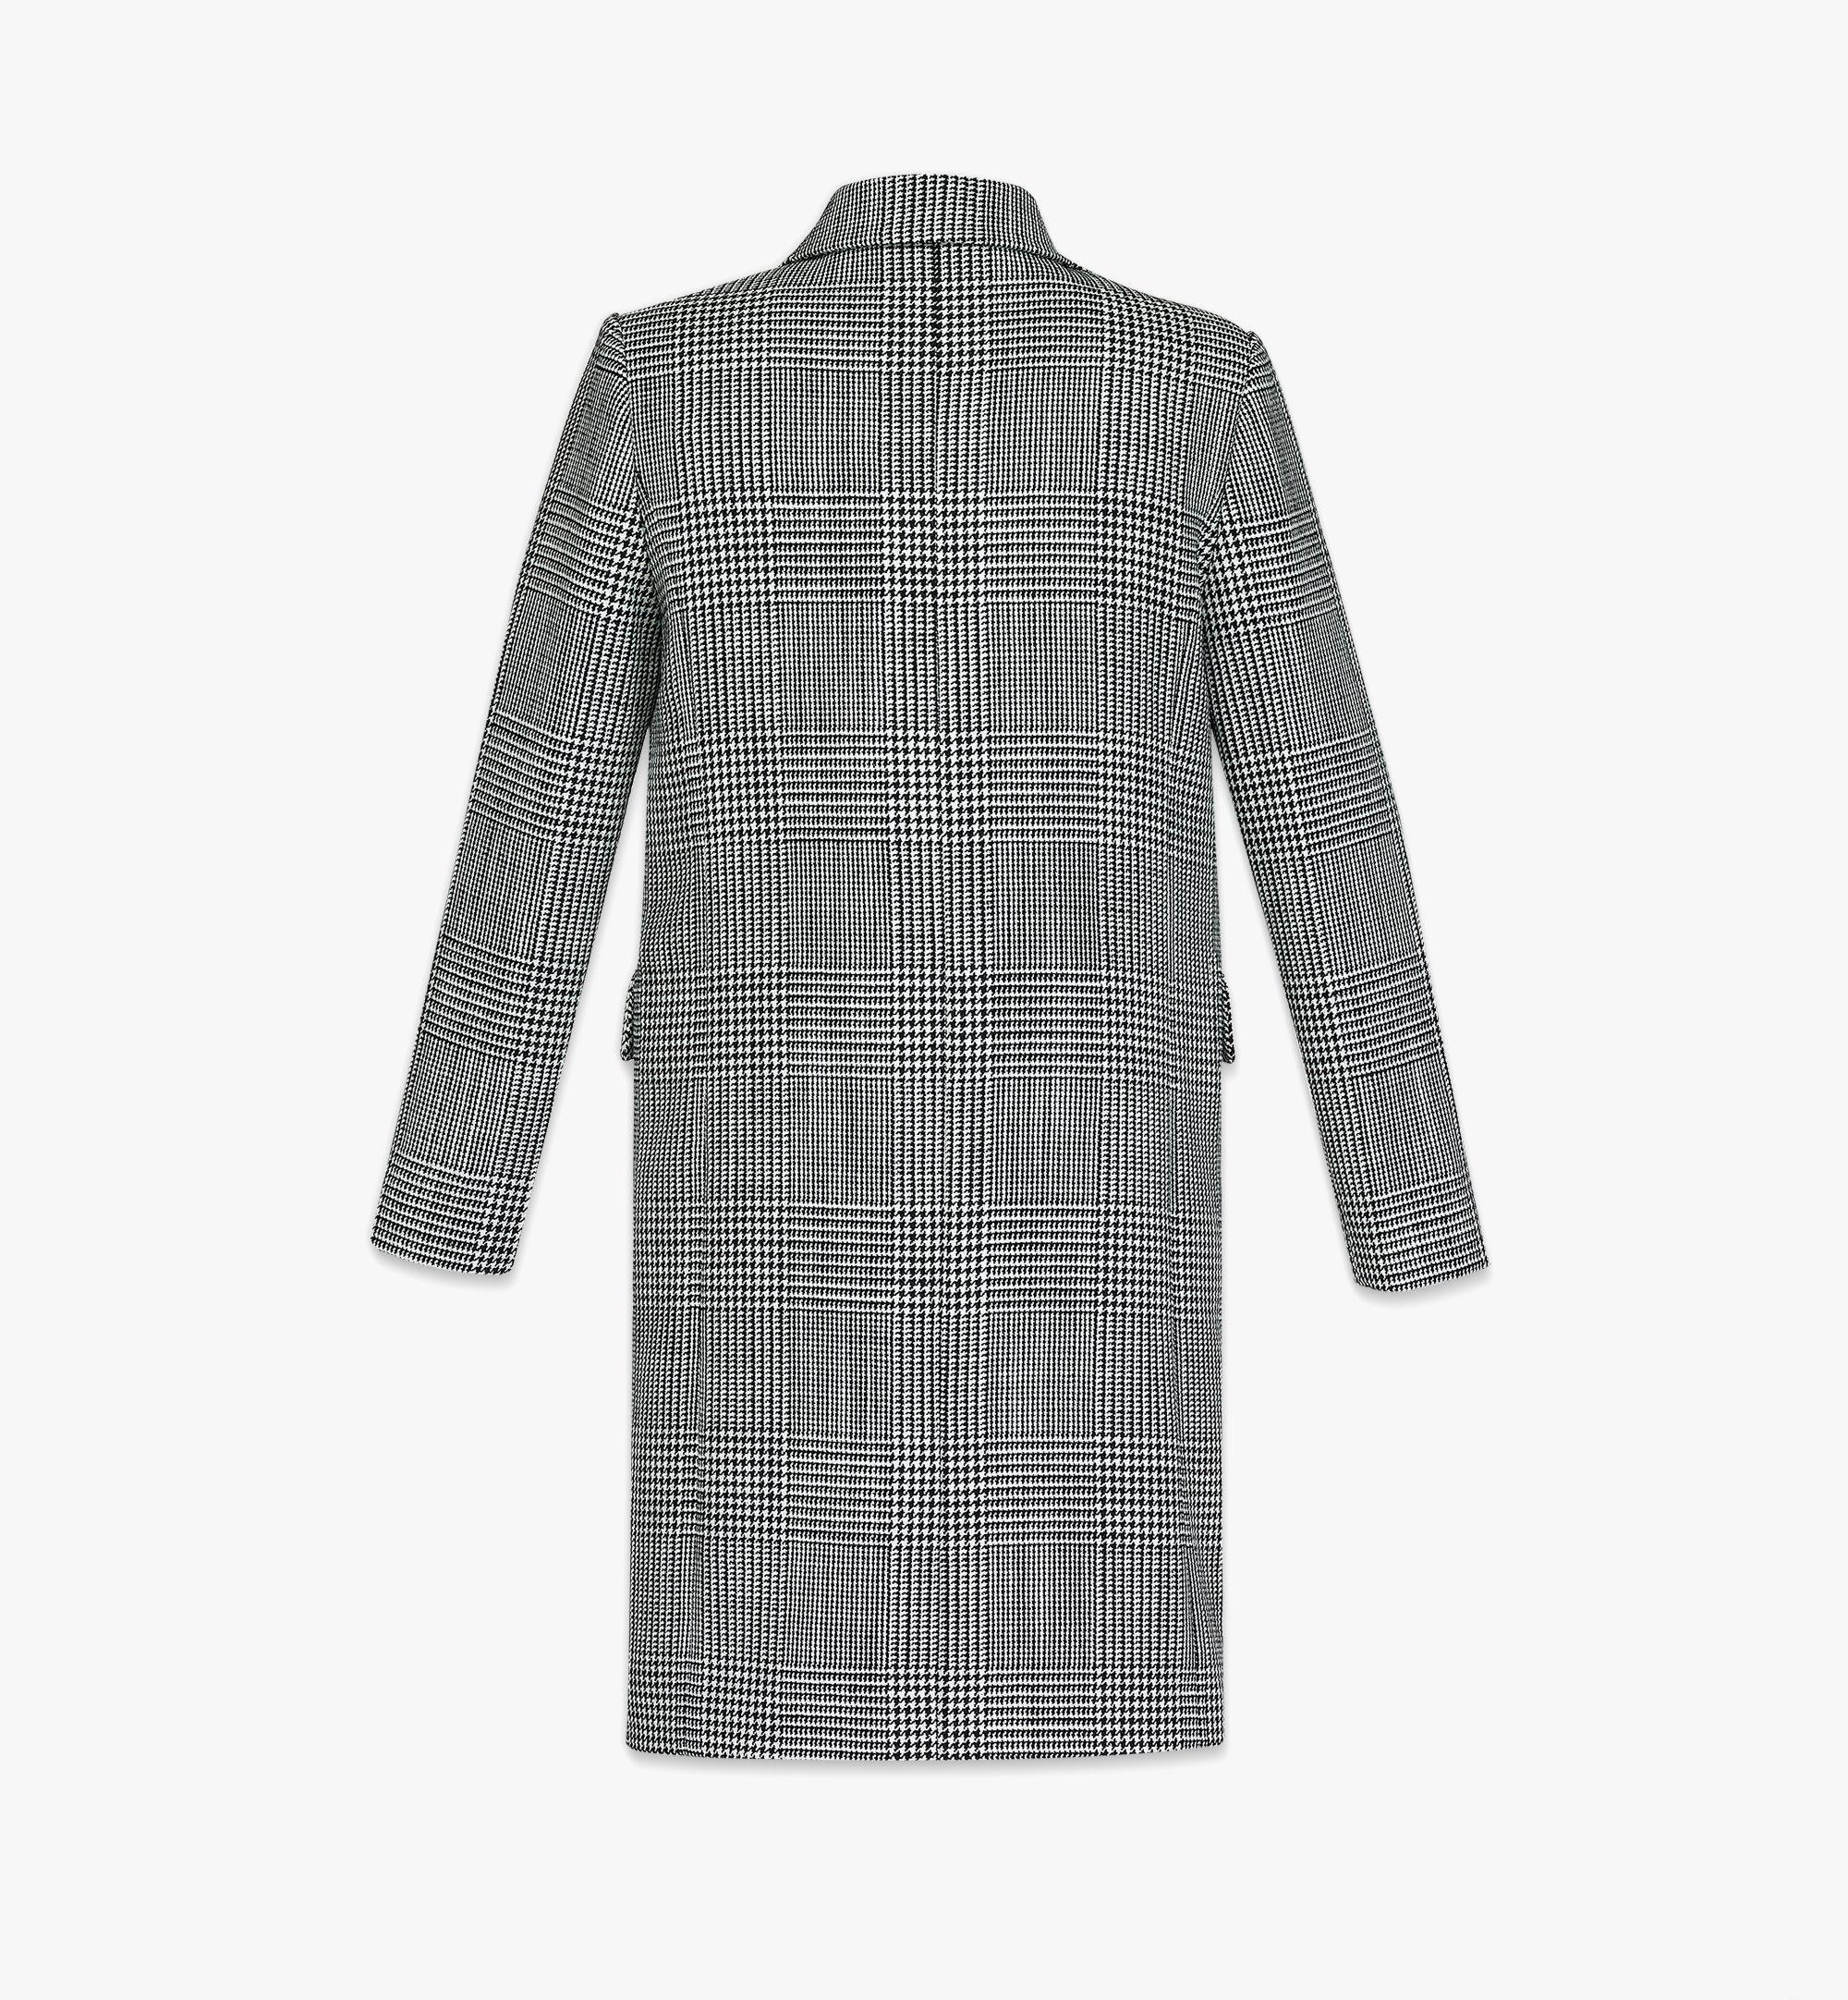 MCM Men's Check Wool Coat with Nylon Overlay Black MHCBAMM01BK046 Alternate View 4